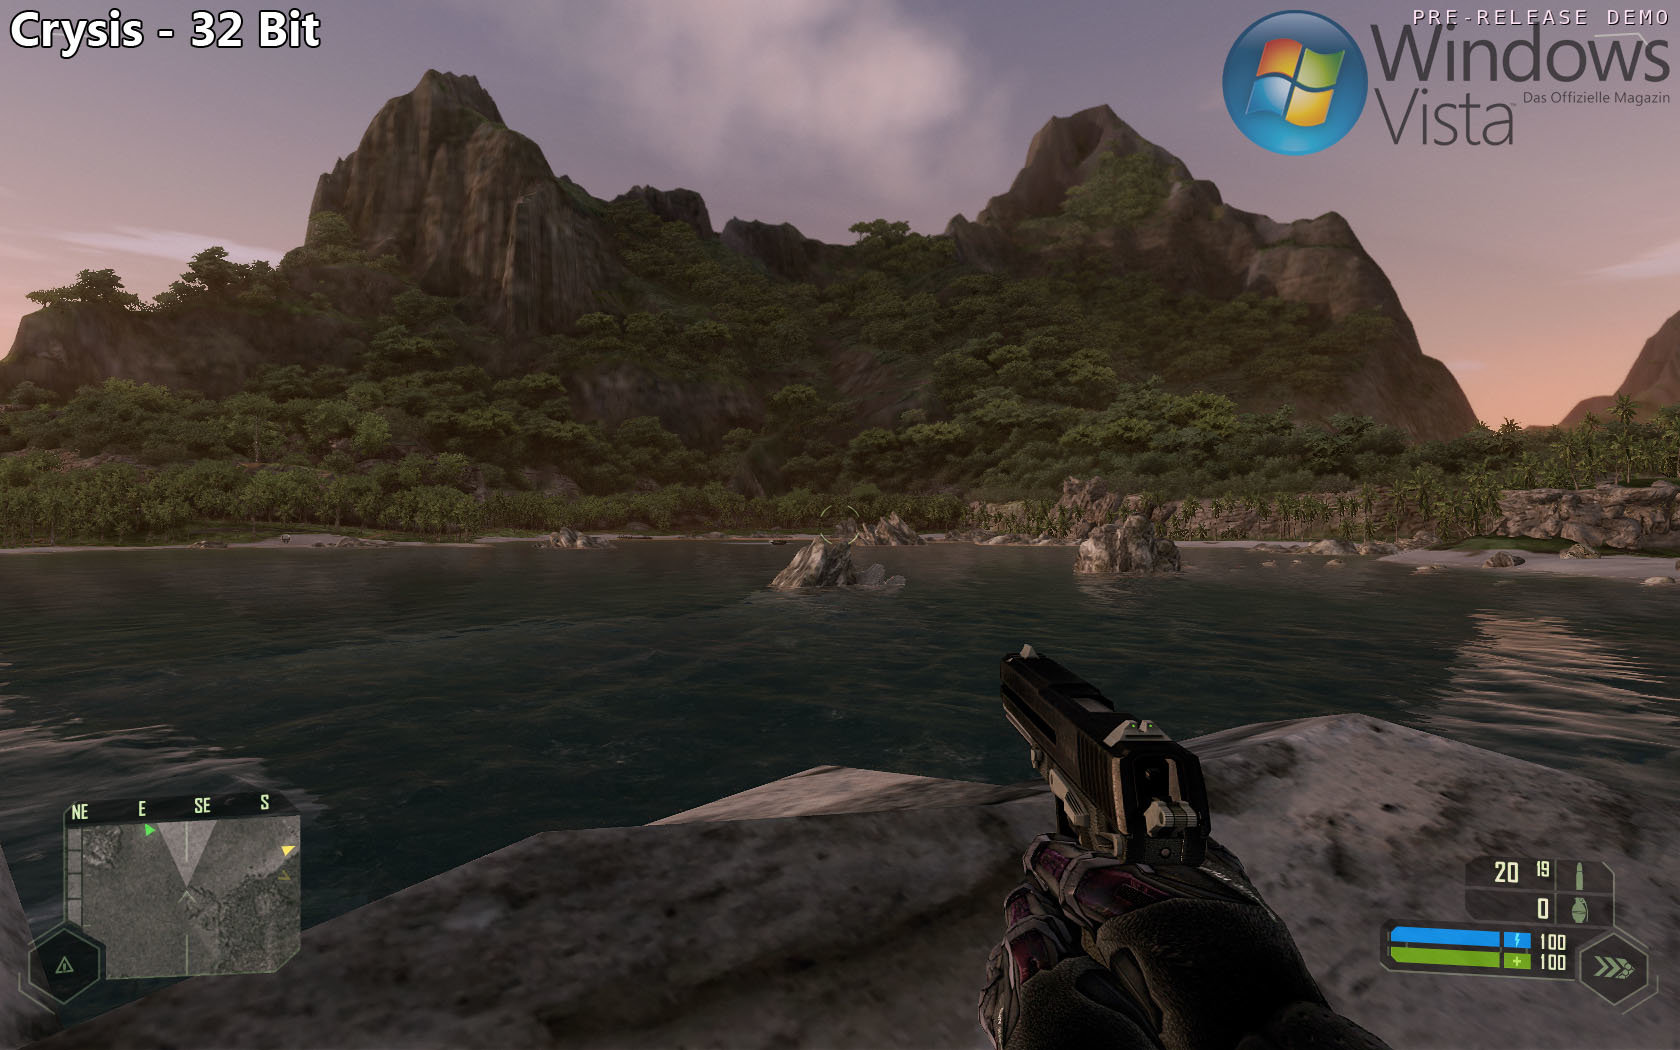 Crysis - Berglandschaft (32 Bit)